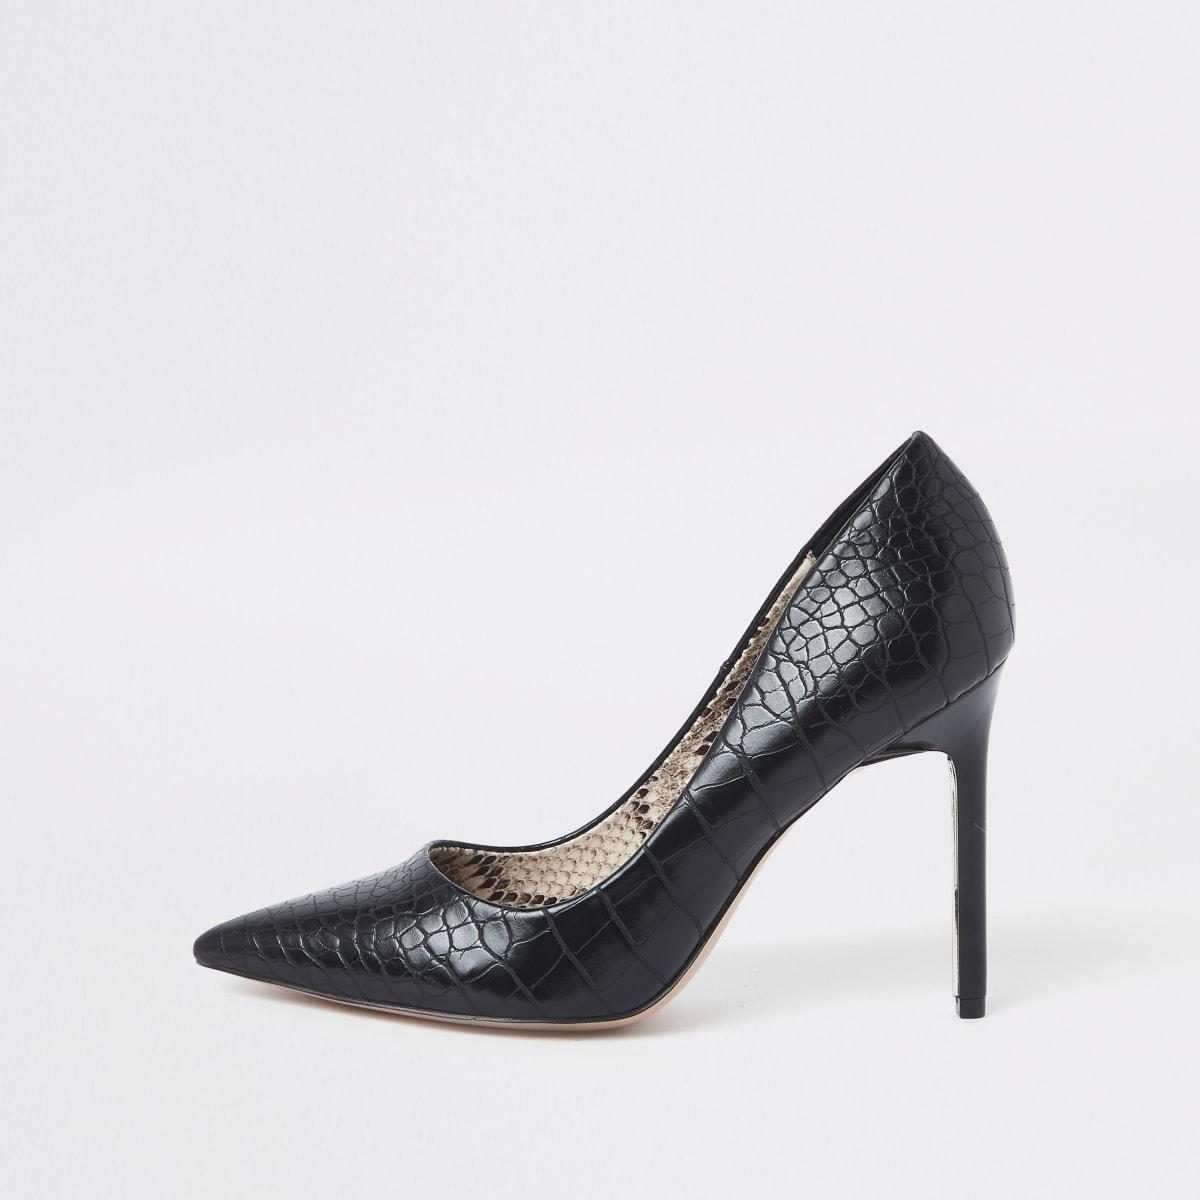 Black croc embossed pumps